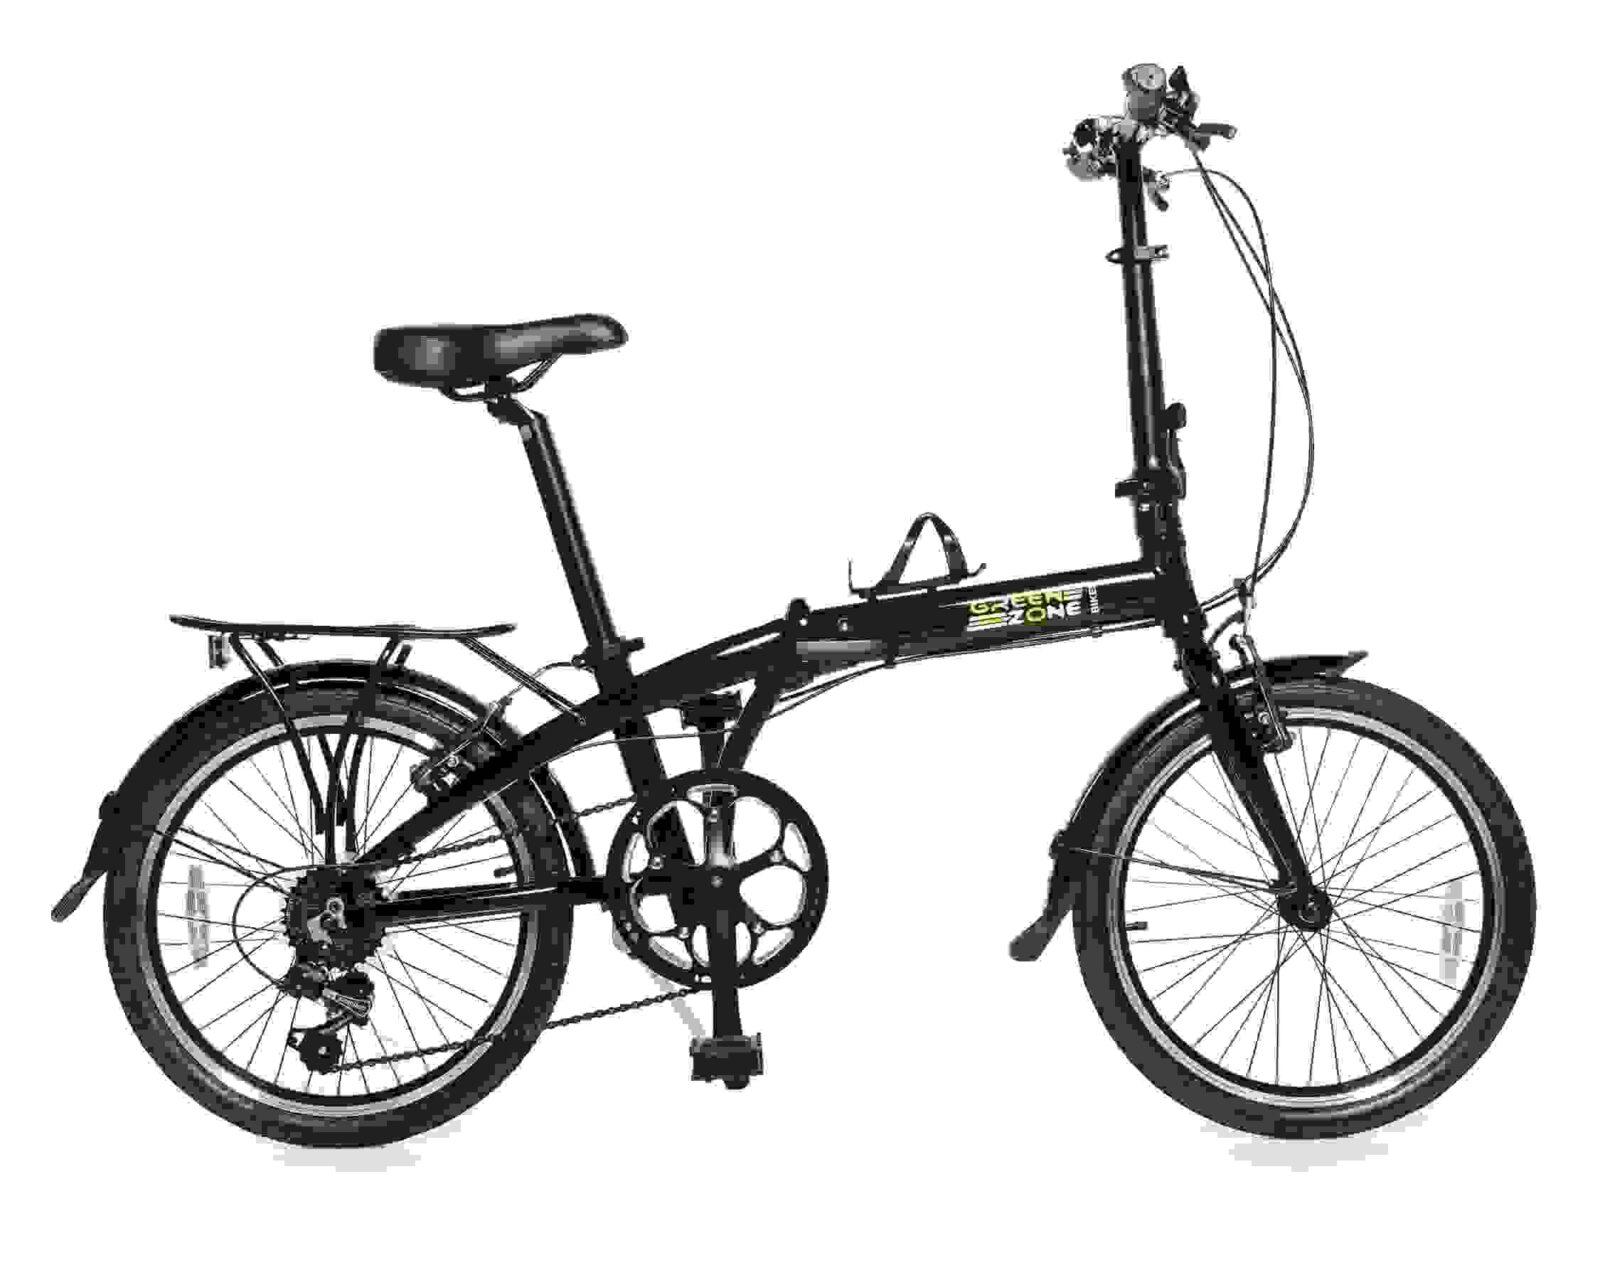 Premium Edition Model 20″ (Black) Alloy 7-Speed